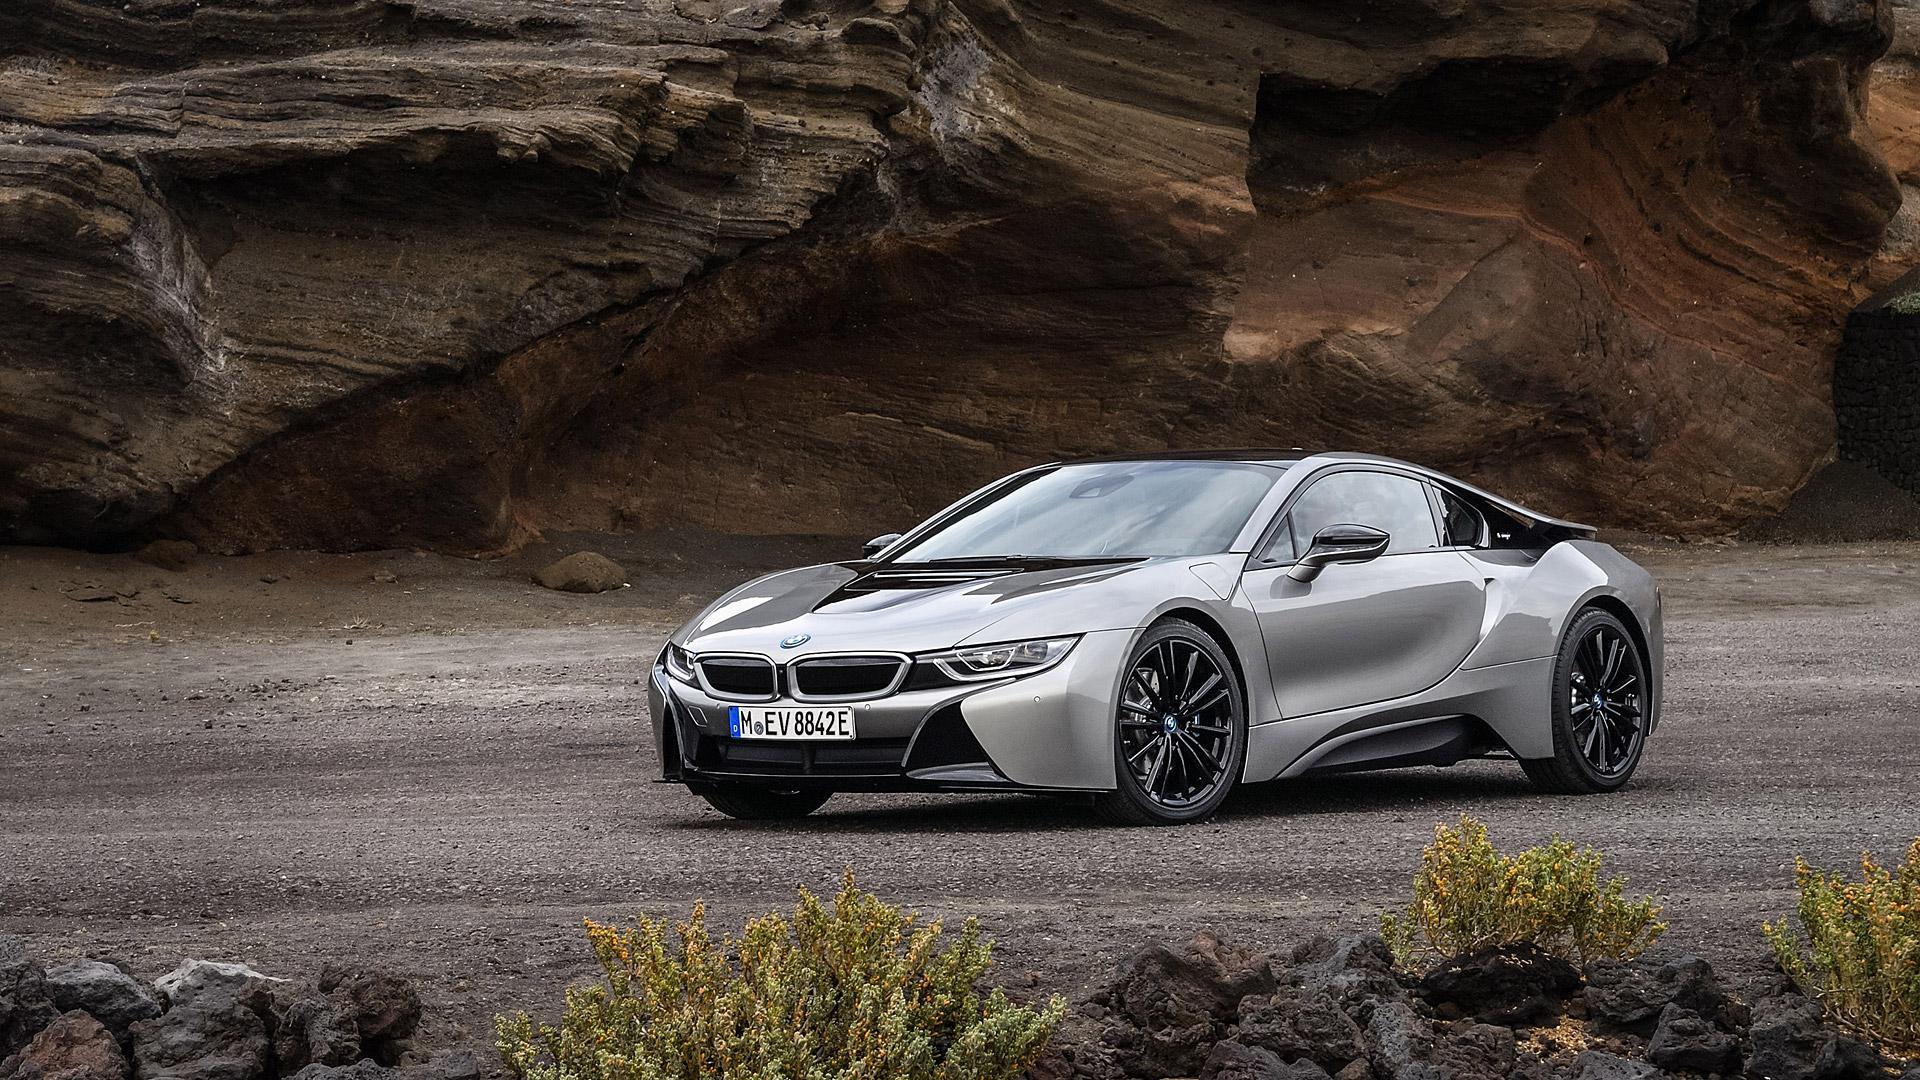 2019 BMW I8 Wallpapers - Wallpaper Cave